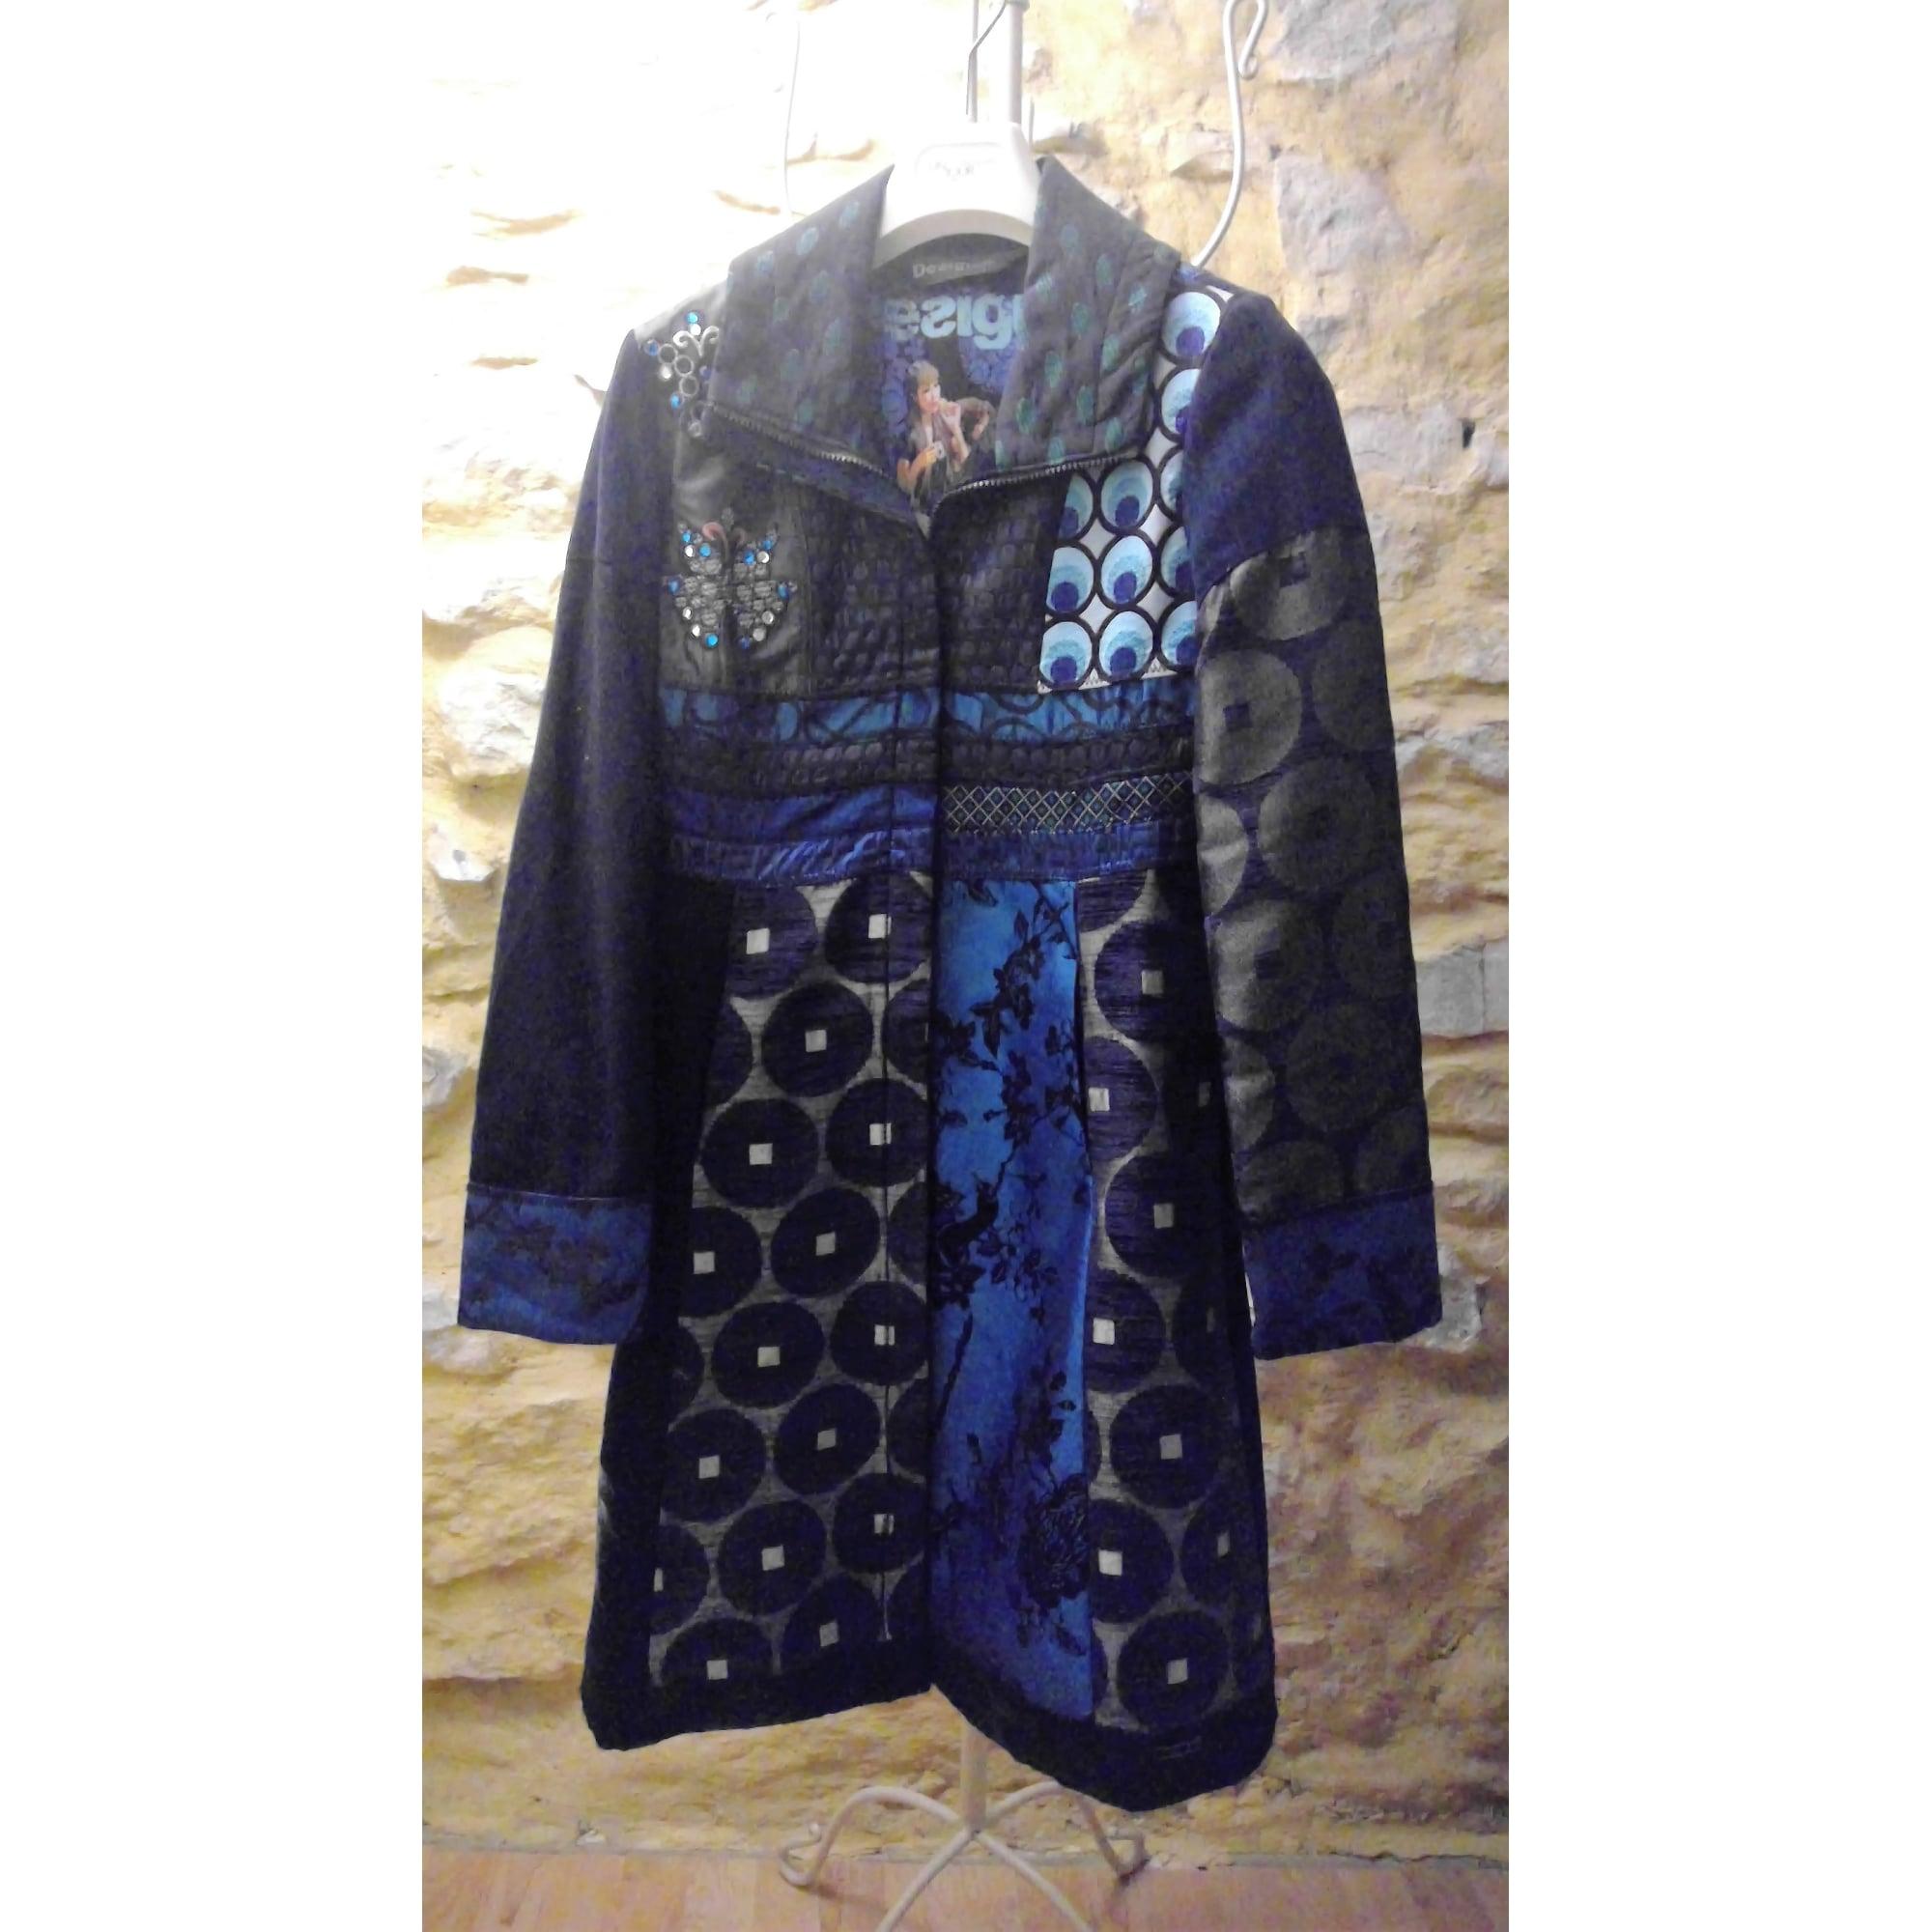 bleu bleu DESIGUAL Bleu marine turquoise Manteau dIwpqxEA